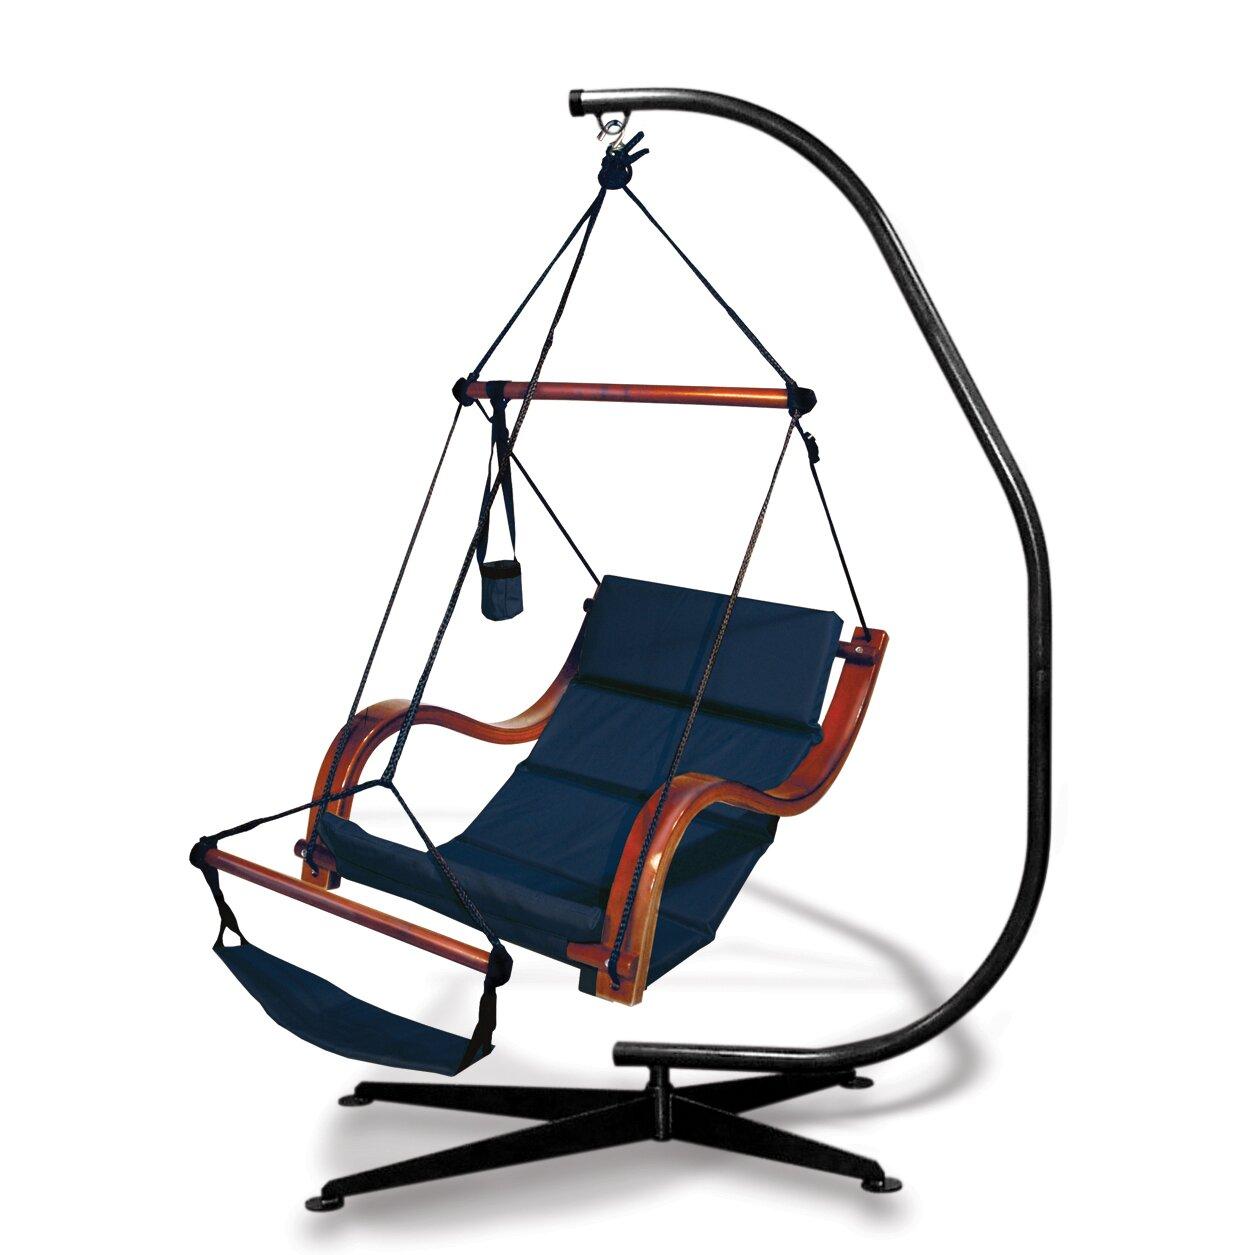 1255 #A63D25 Outdoor Patio Furniture Chair Hammocks Hammaka SKU: YT1142  Image Nami Patio Doors